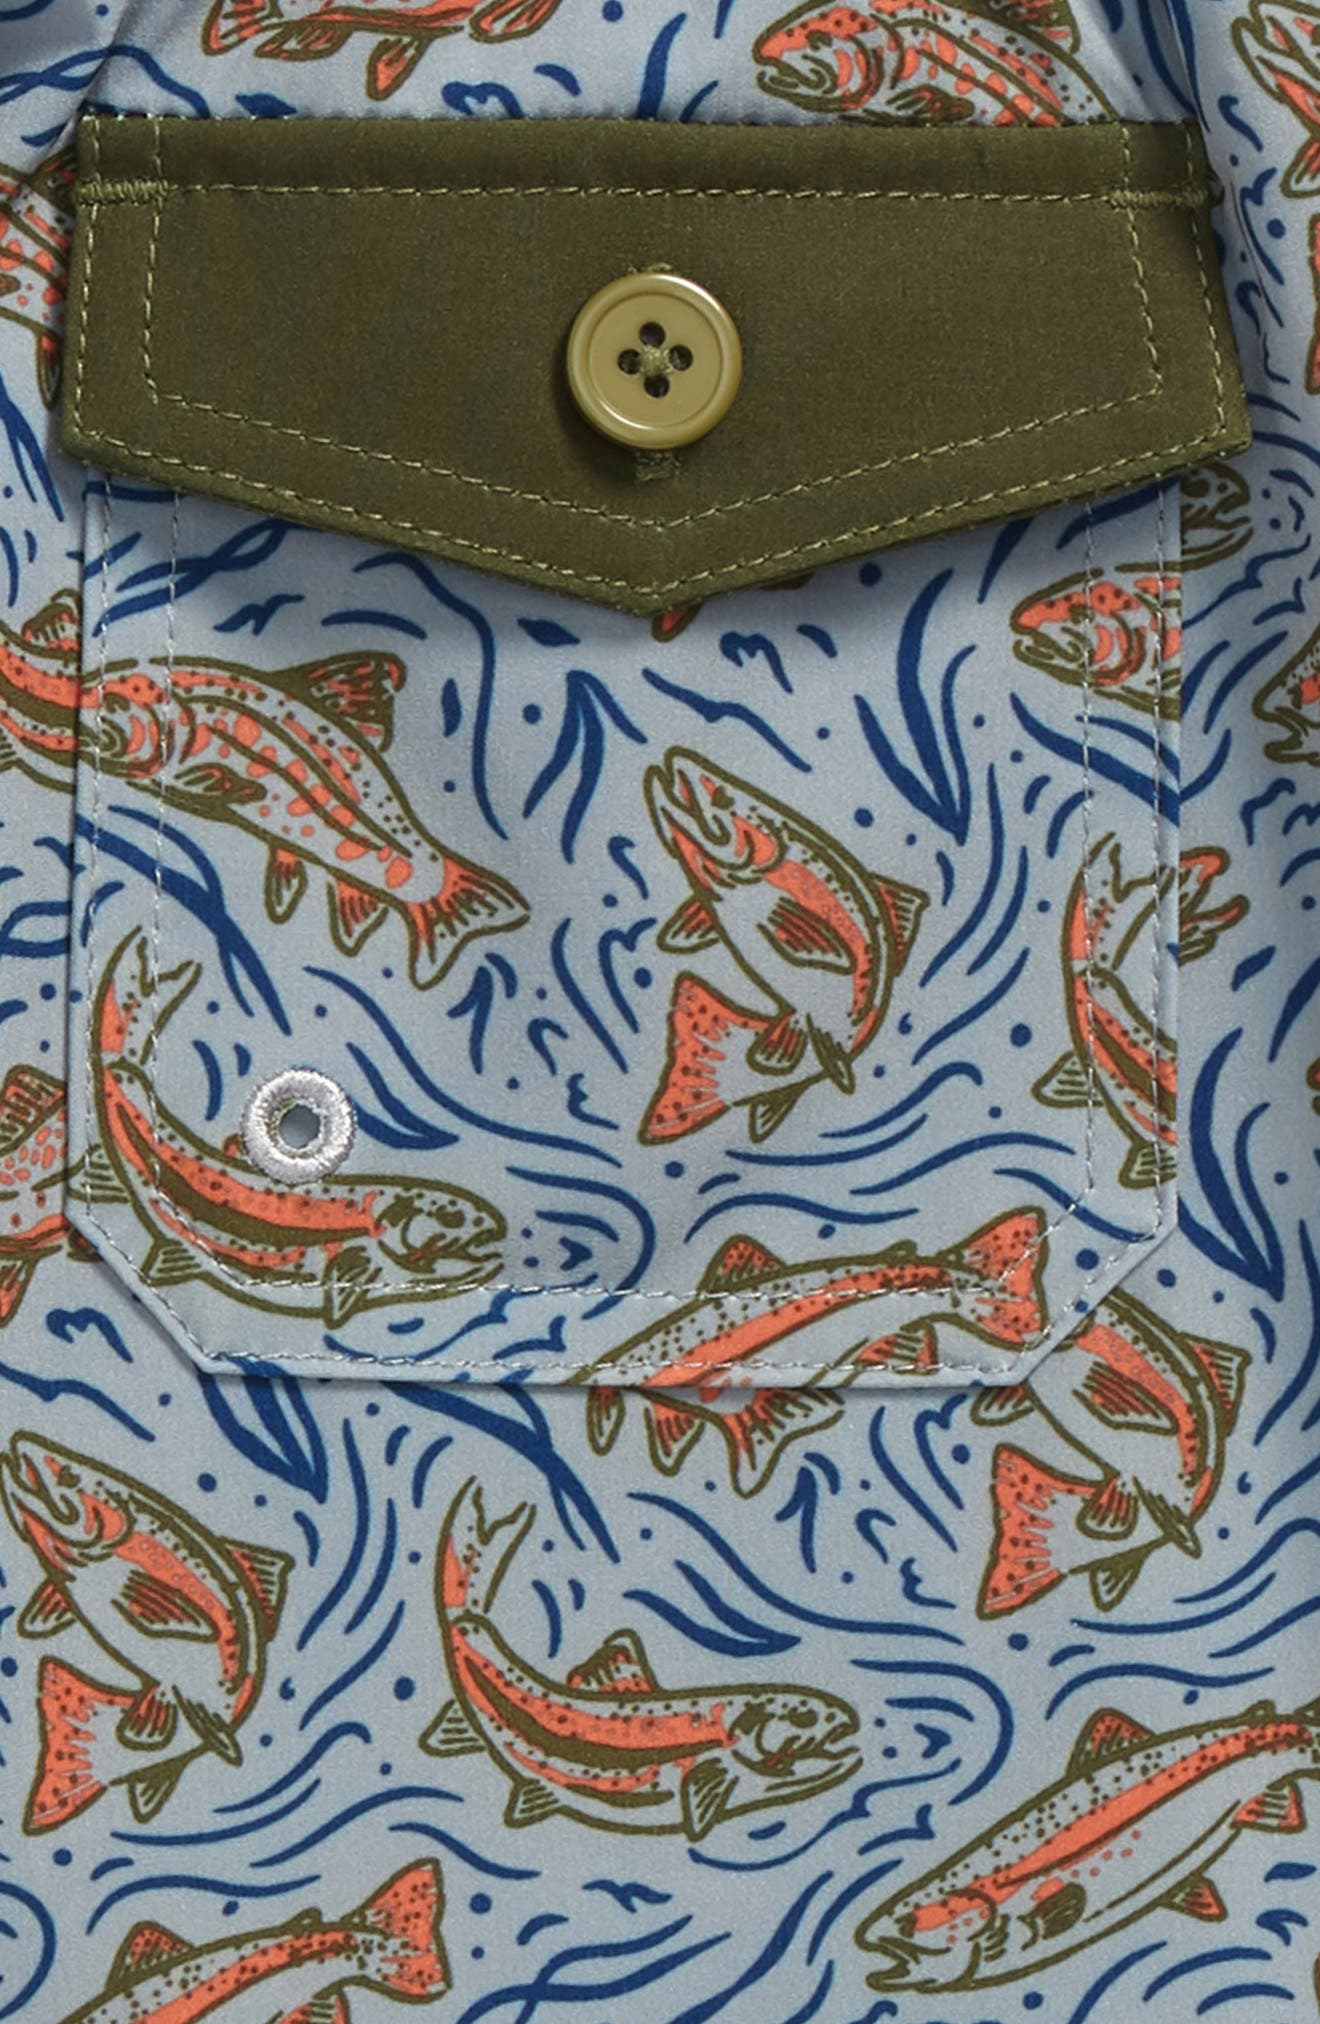 Upstream Board Shorts,                             Alternate thumbnail 3, color,                             020